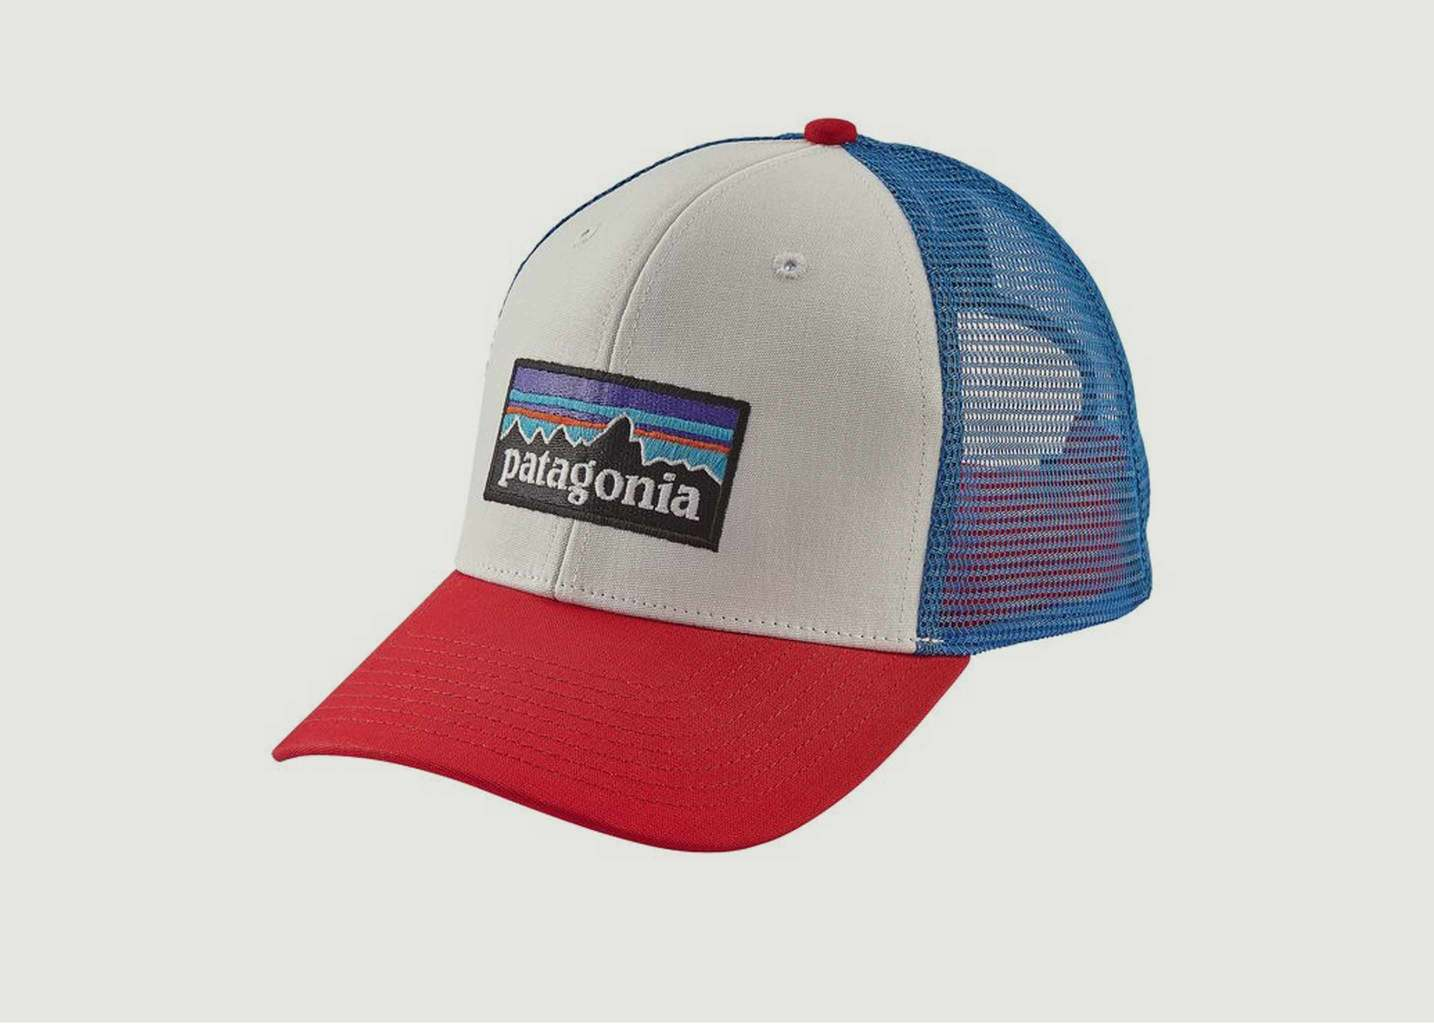 Casquette Tricolore Logotypée - Patagonia